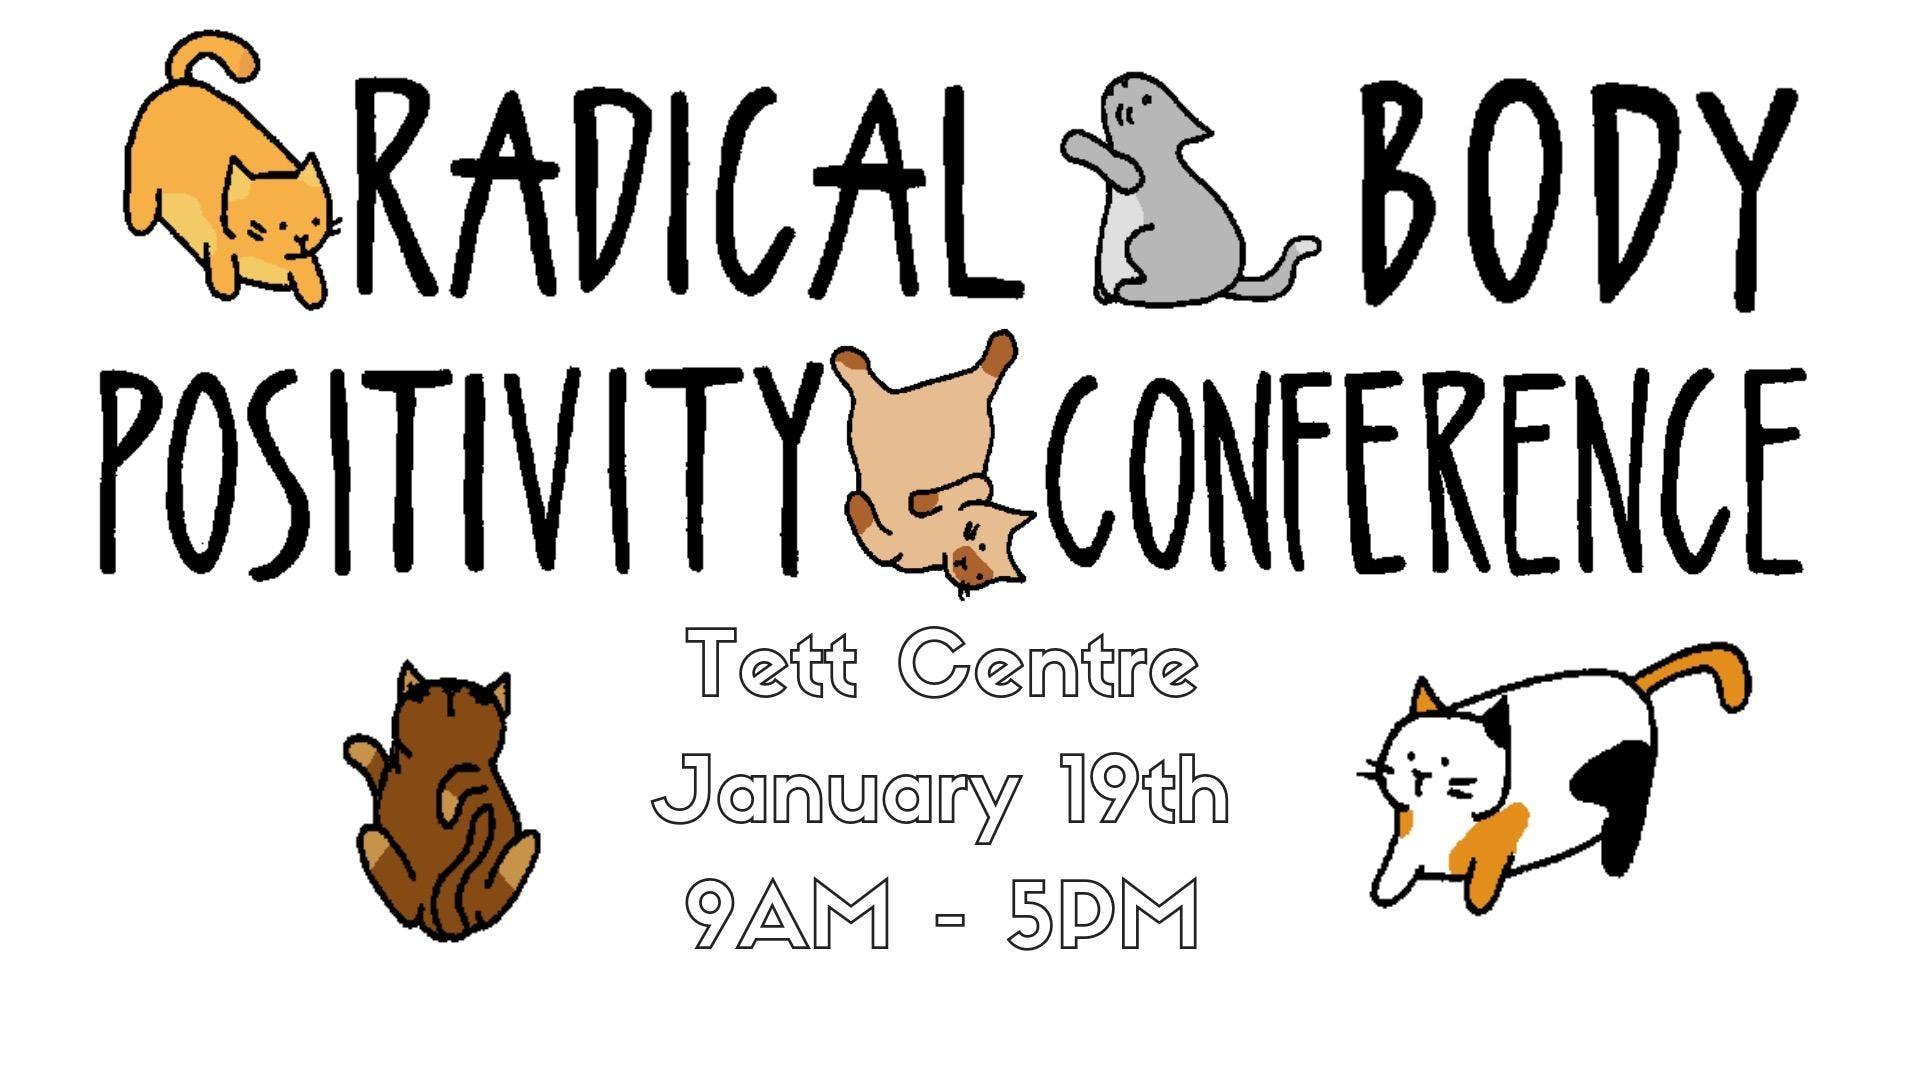 LGAC: Radical Body Positivity Conference